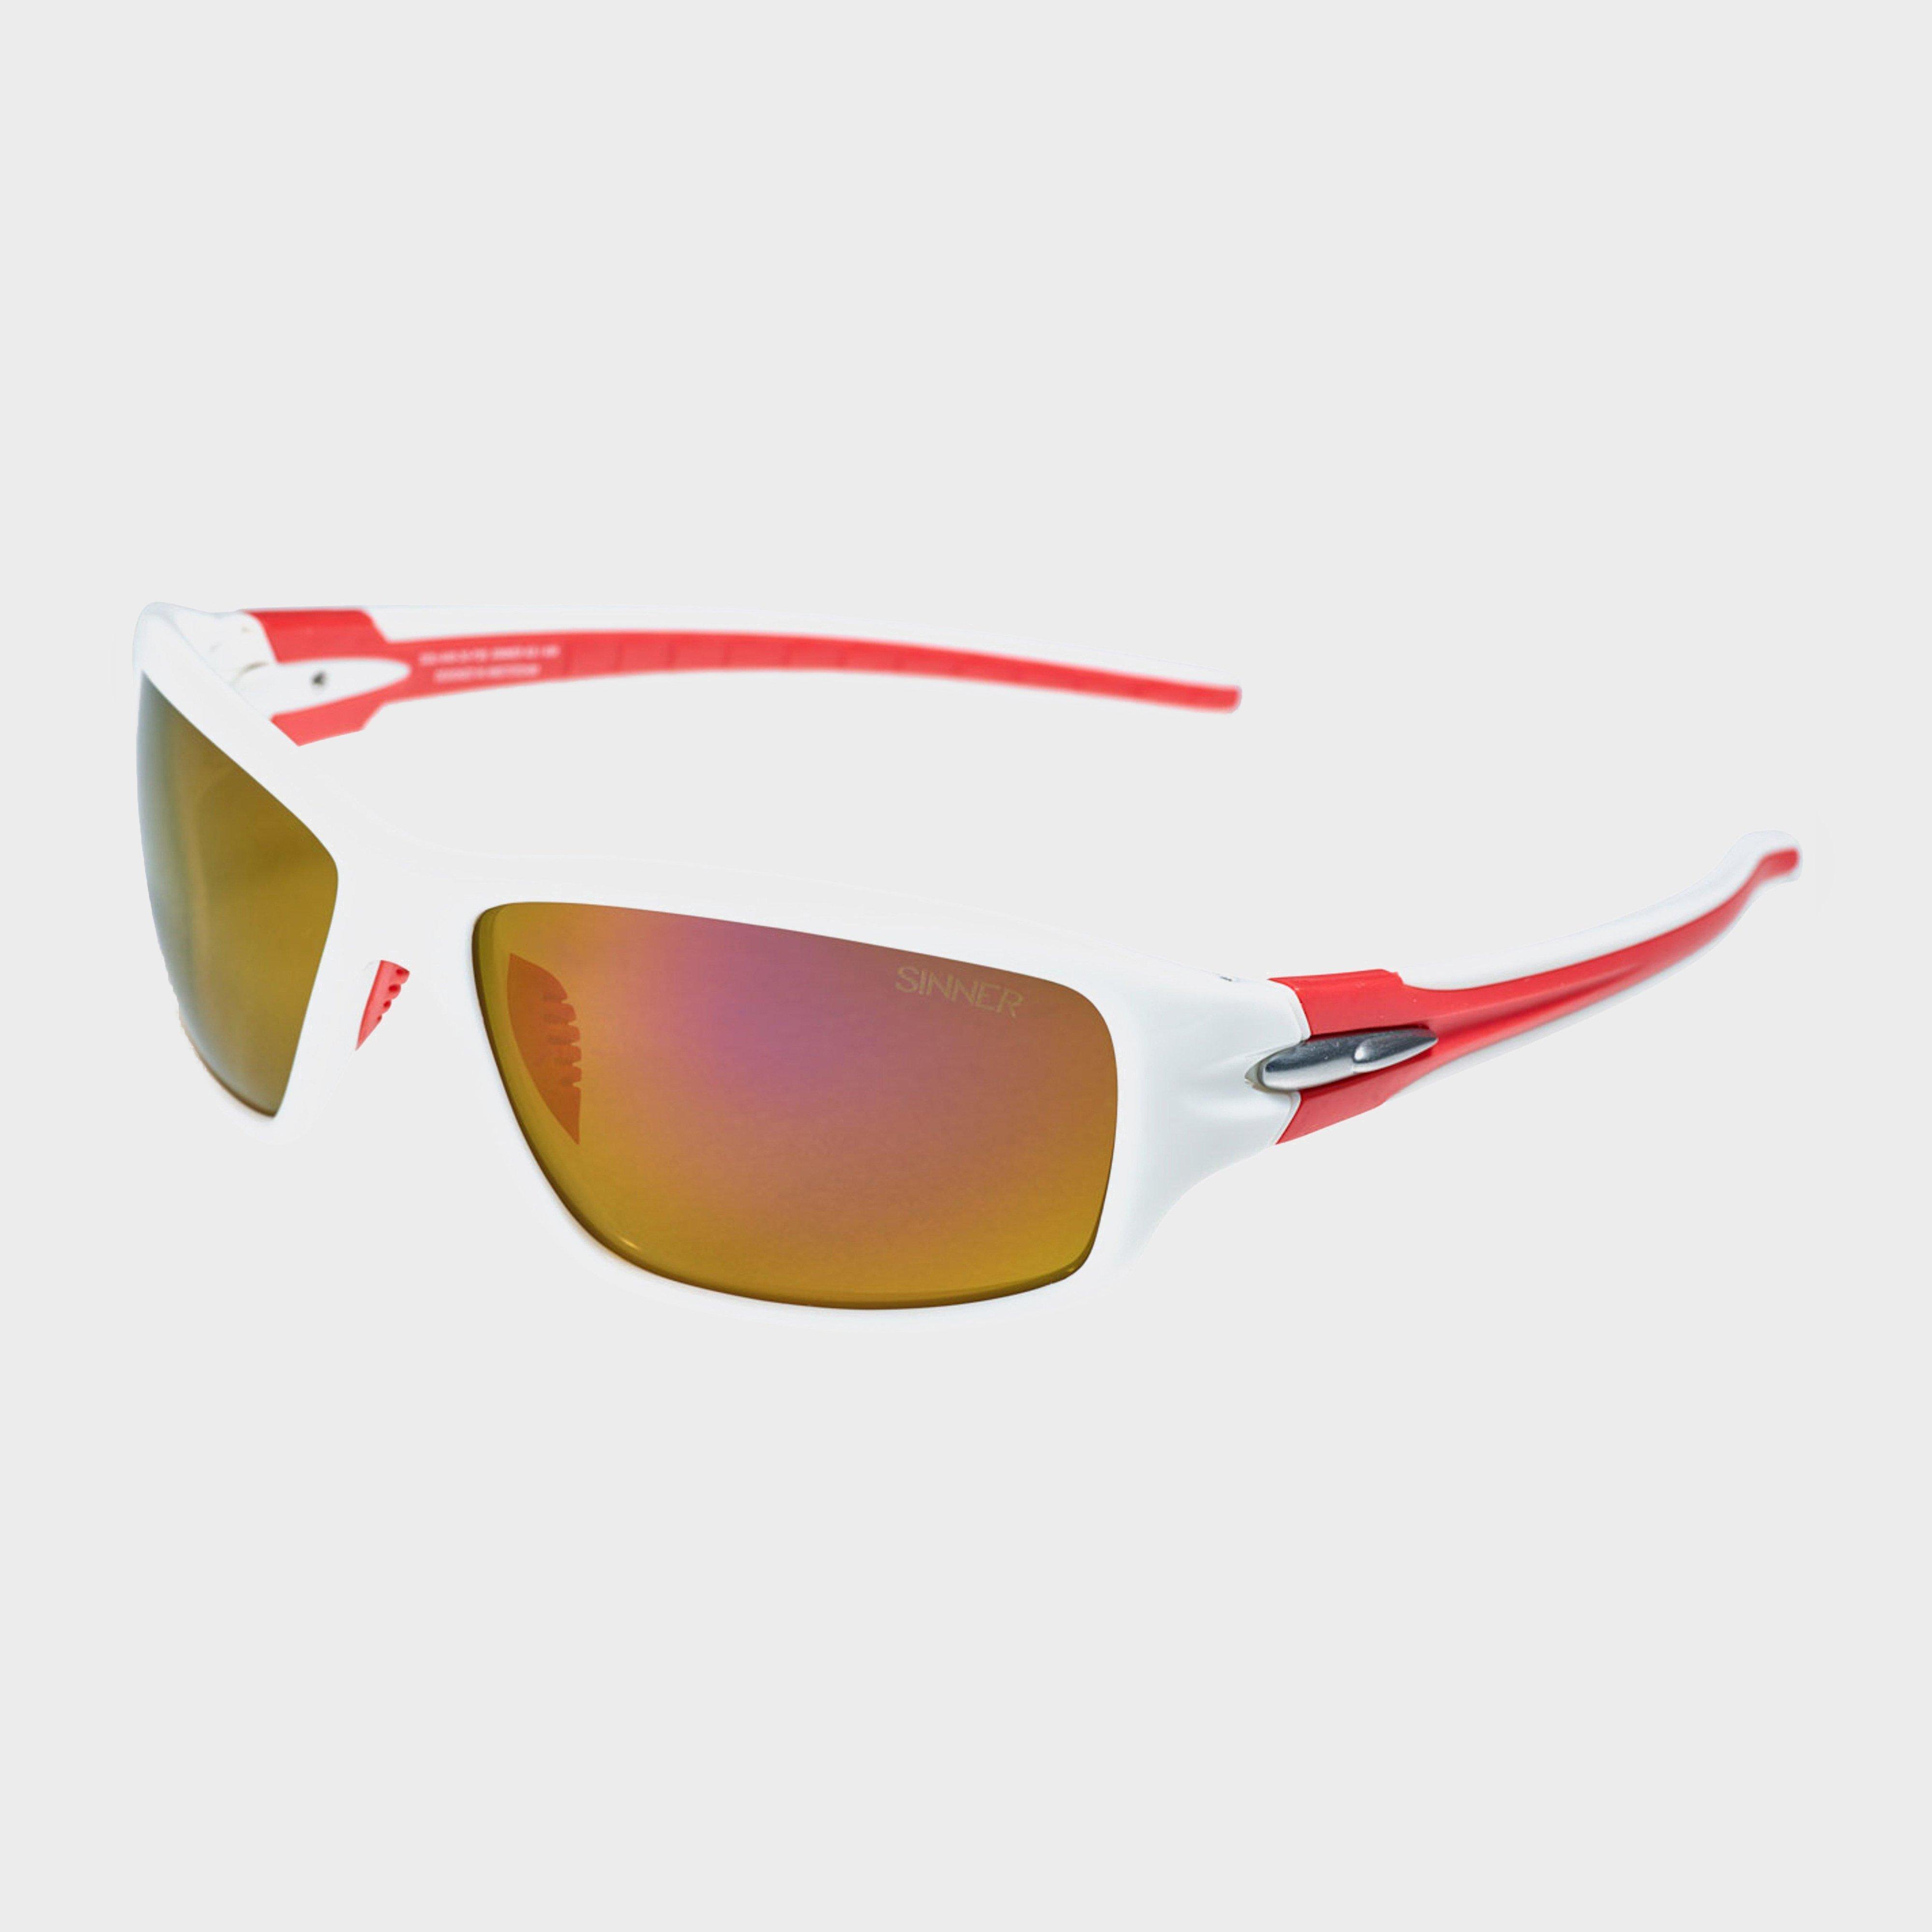 Sinner Sinner Ros Sintec Sport Sunglasses, Brown